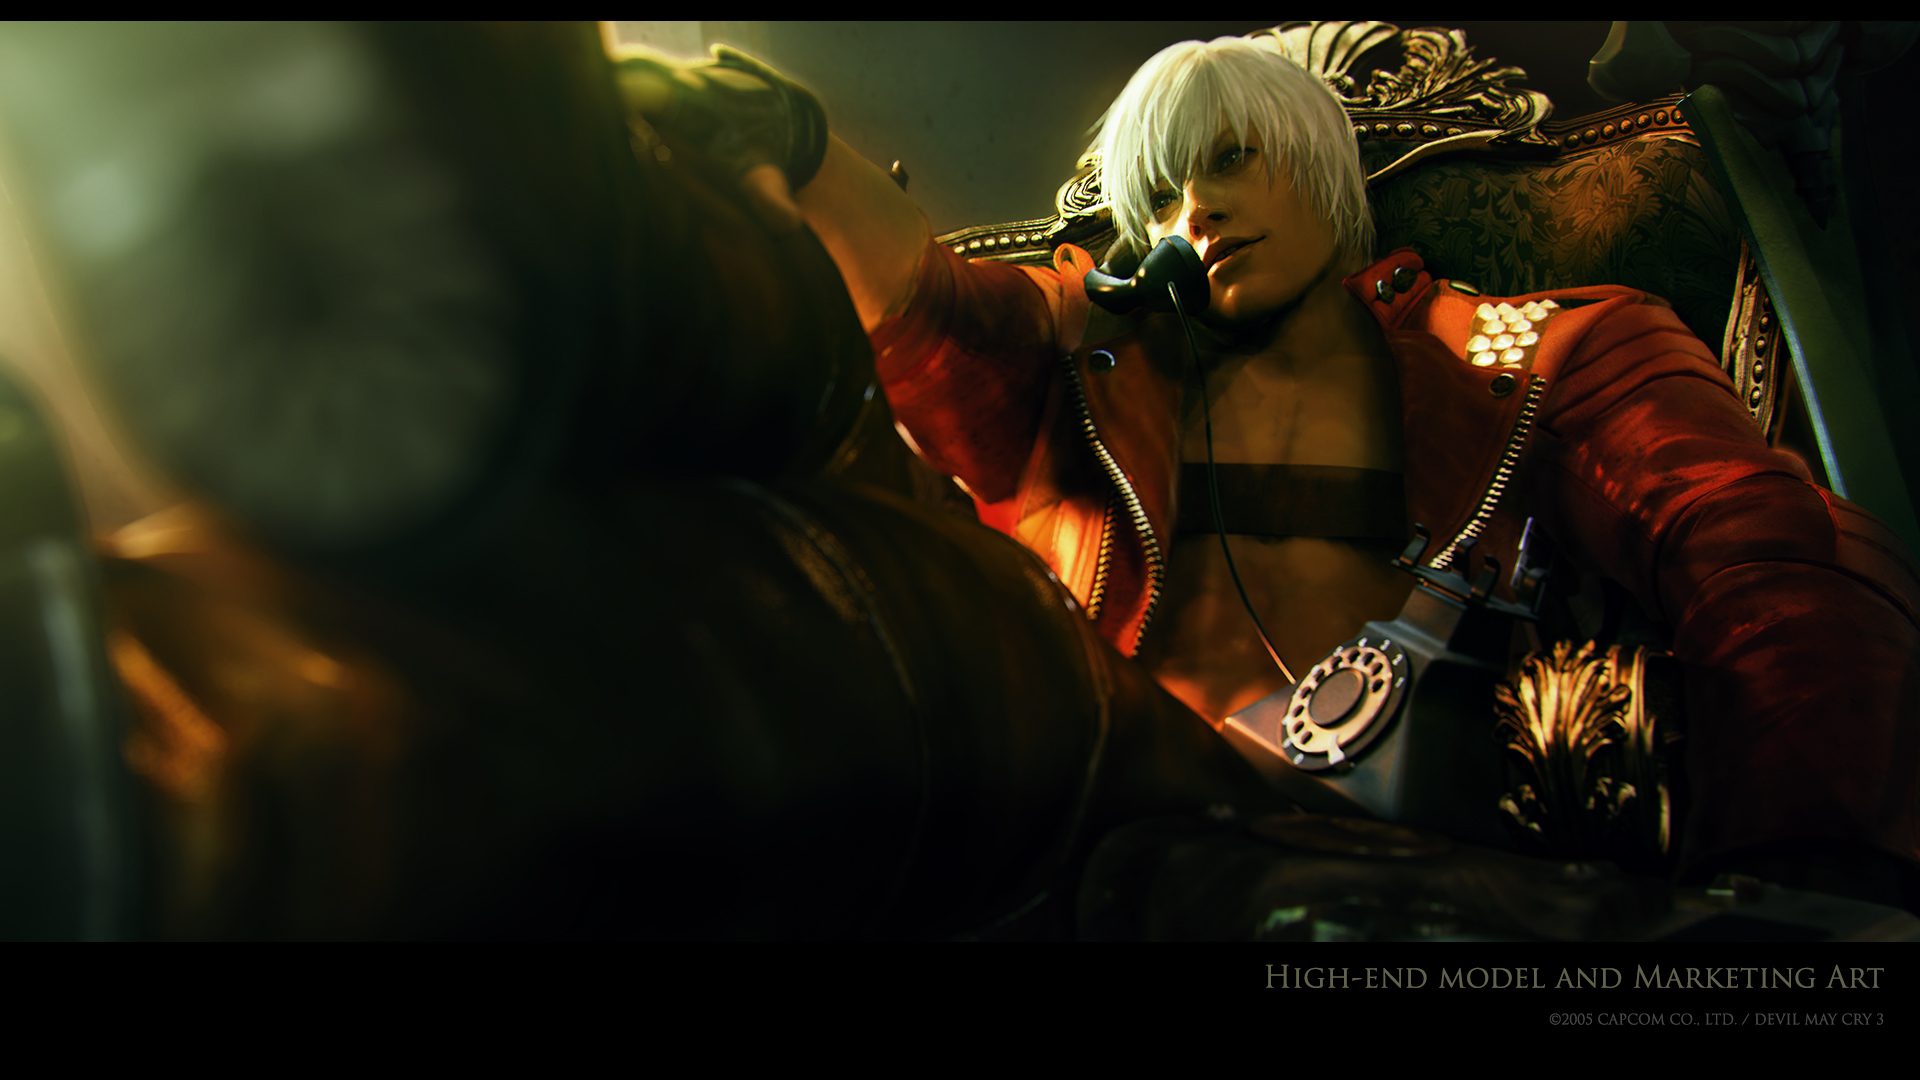 Dante Dmc Marvel Vs Capcom Art Gallery Page 2